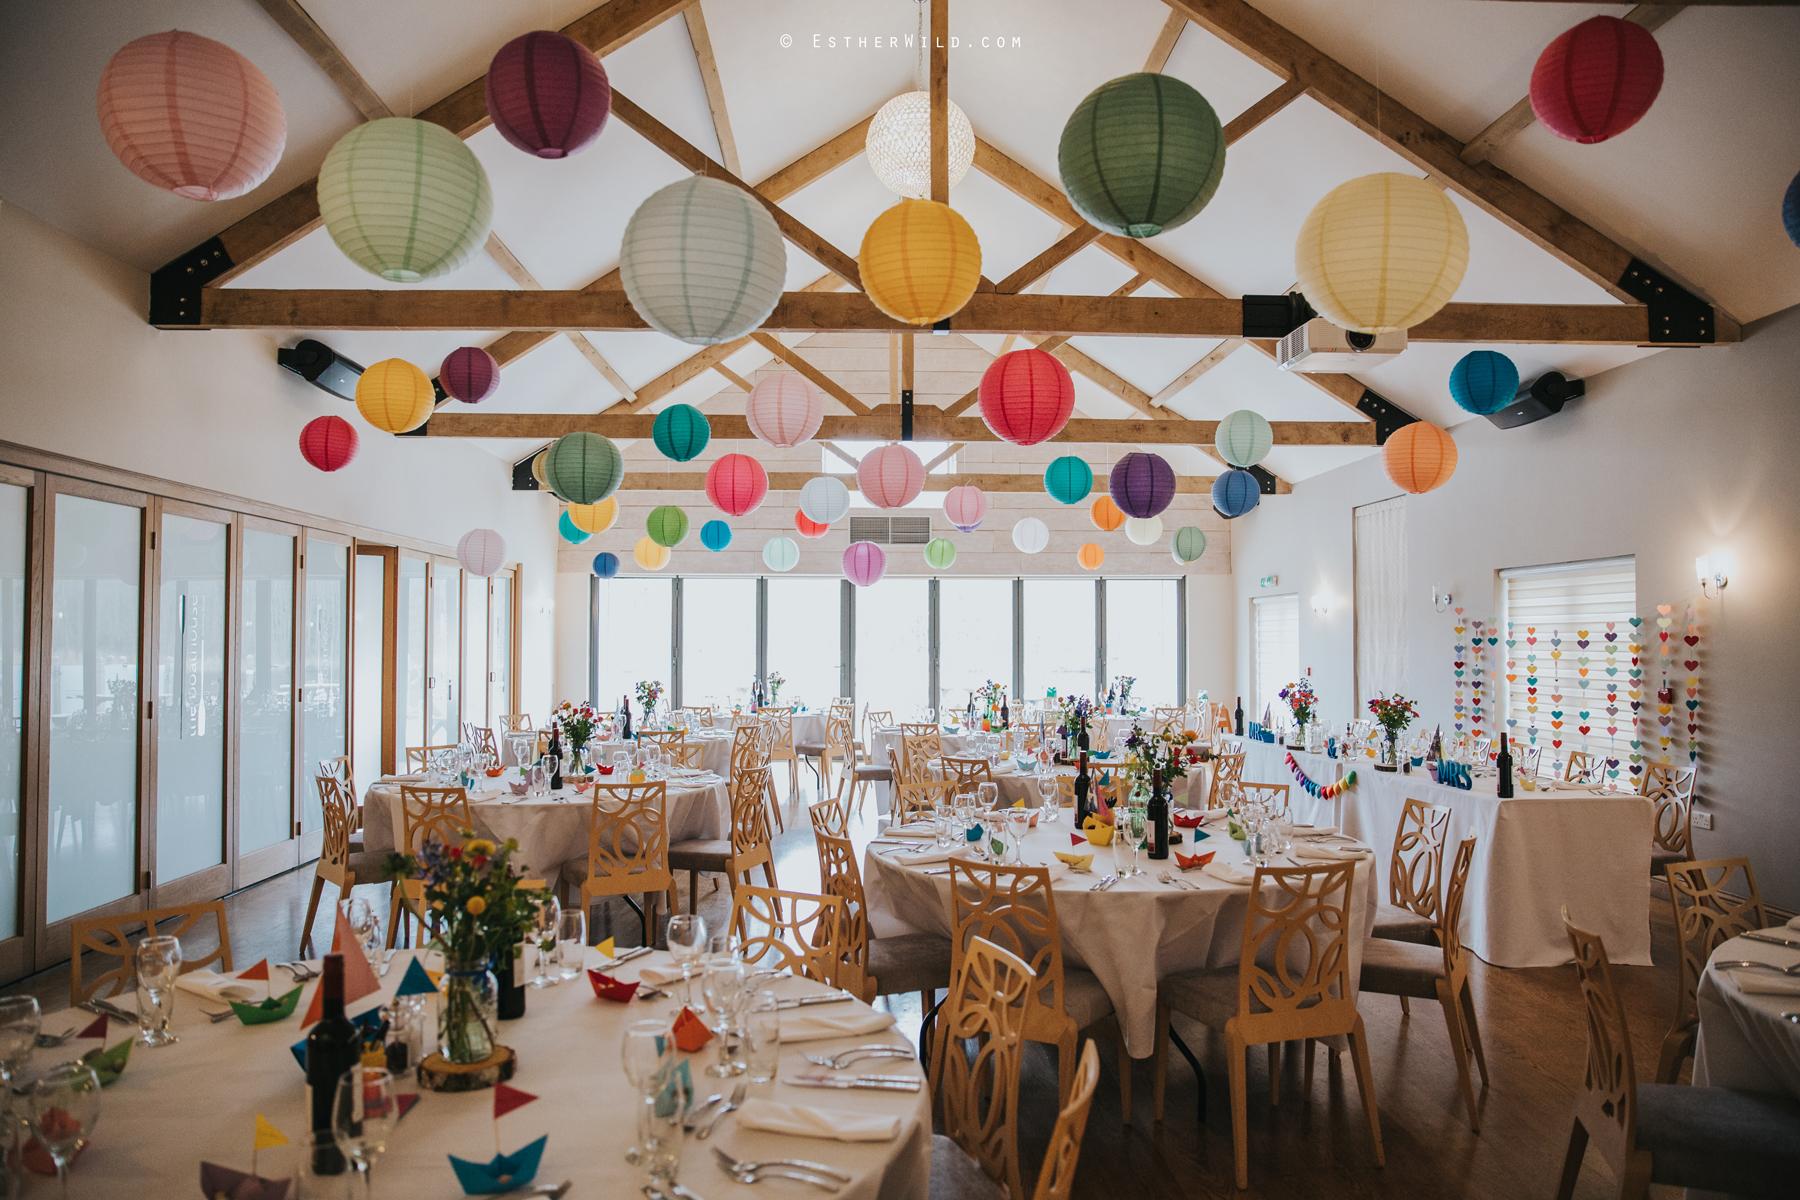 The_BoatHouse_Wedding_Venue_Ormesby_Norfolk_Broads_Boat_Wedding_Photography_Esther_Wild_Photographer_IMG_0131.jpg